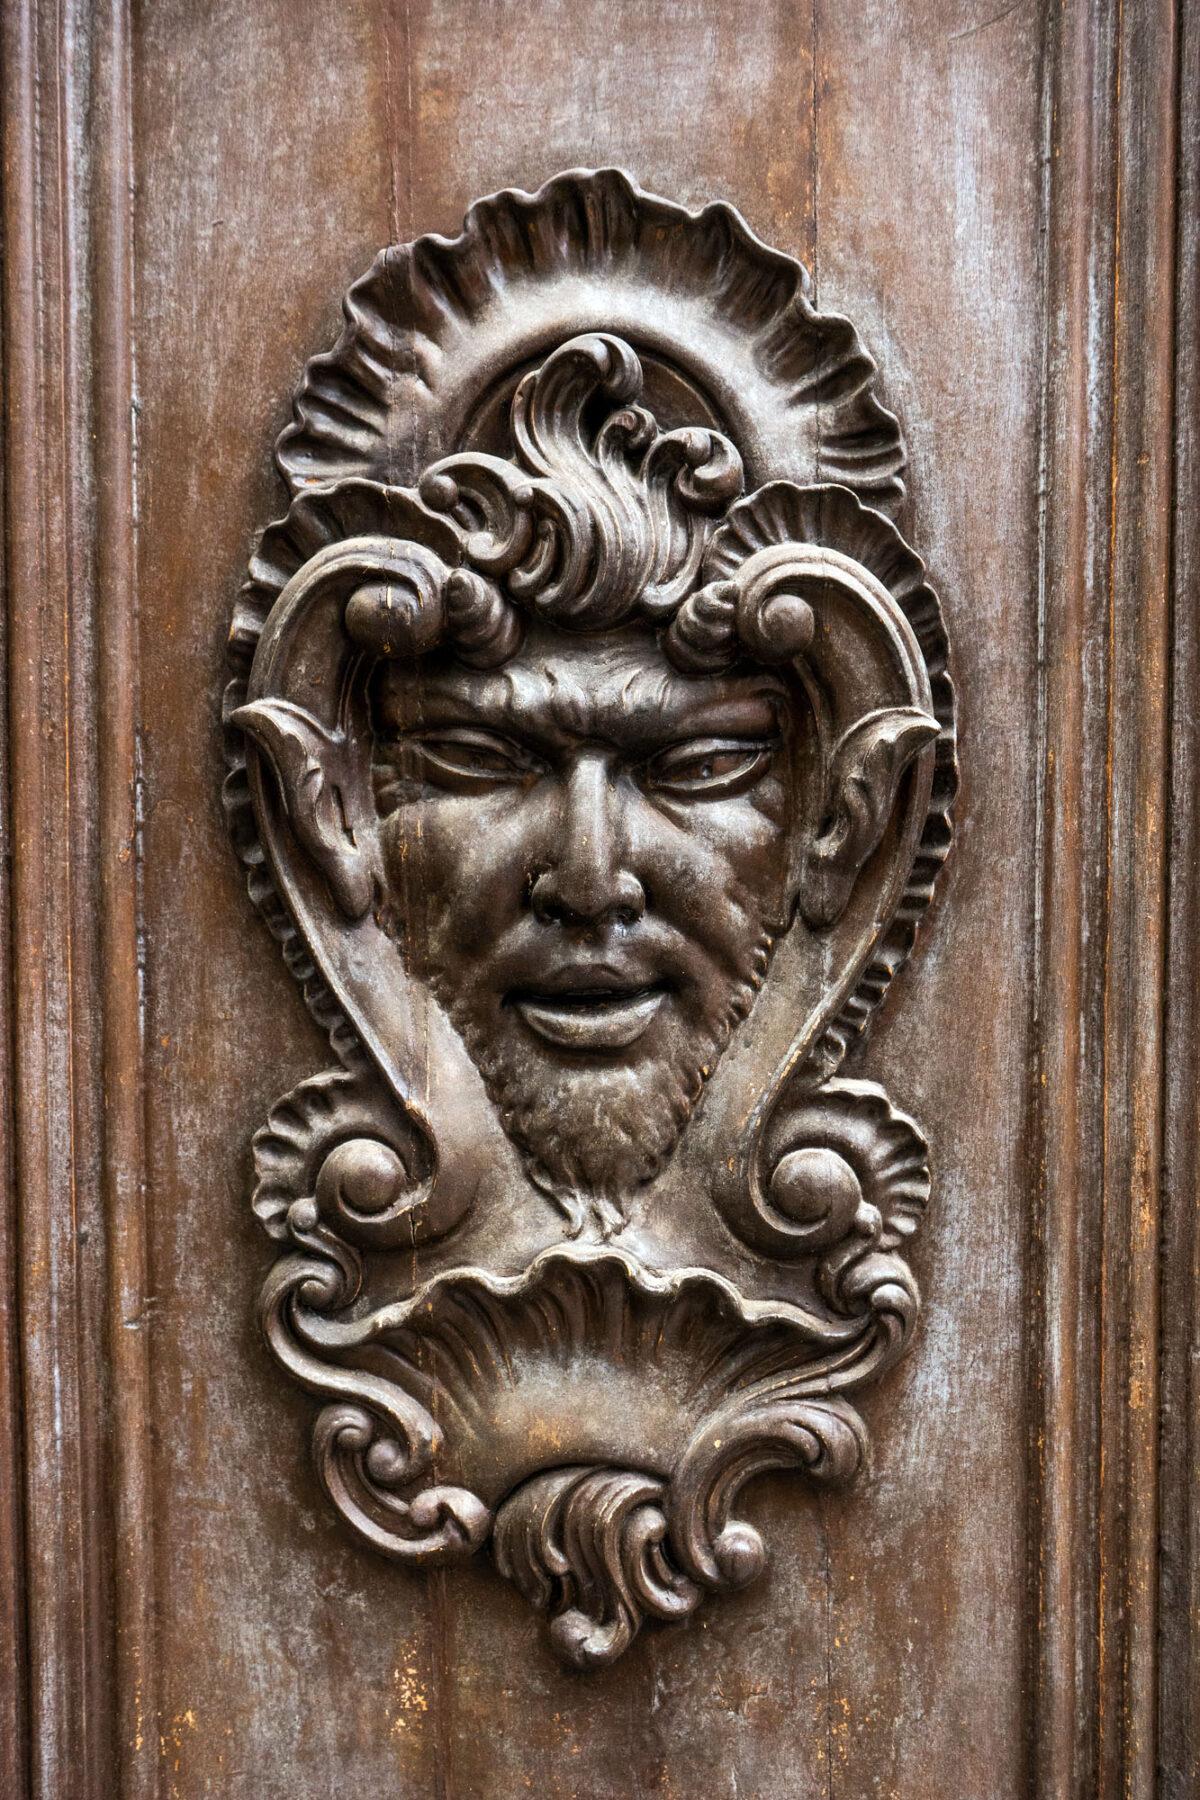 Face Wood Carving Door Valencia